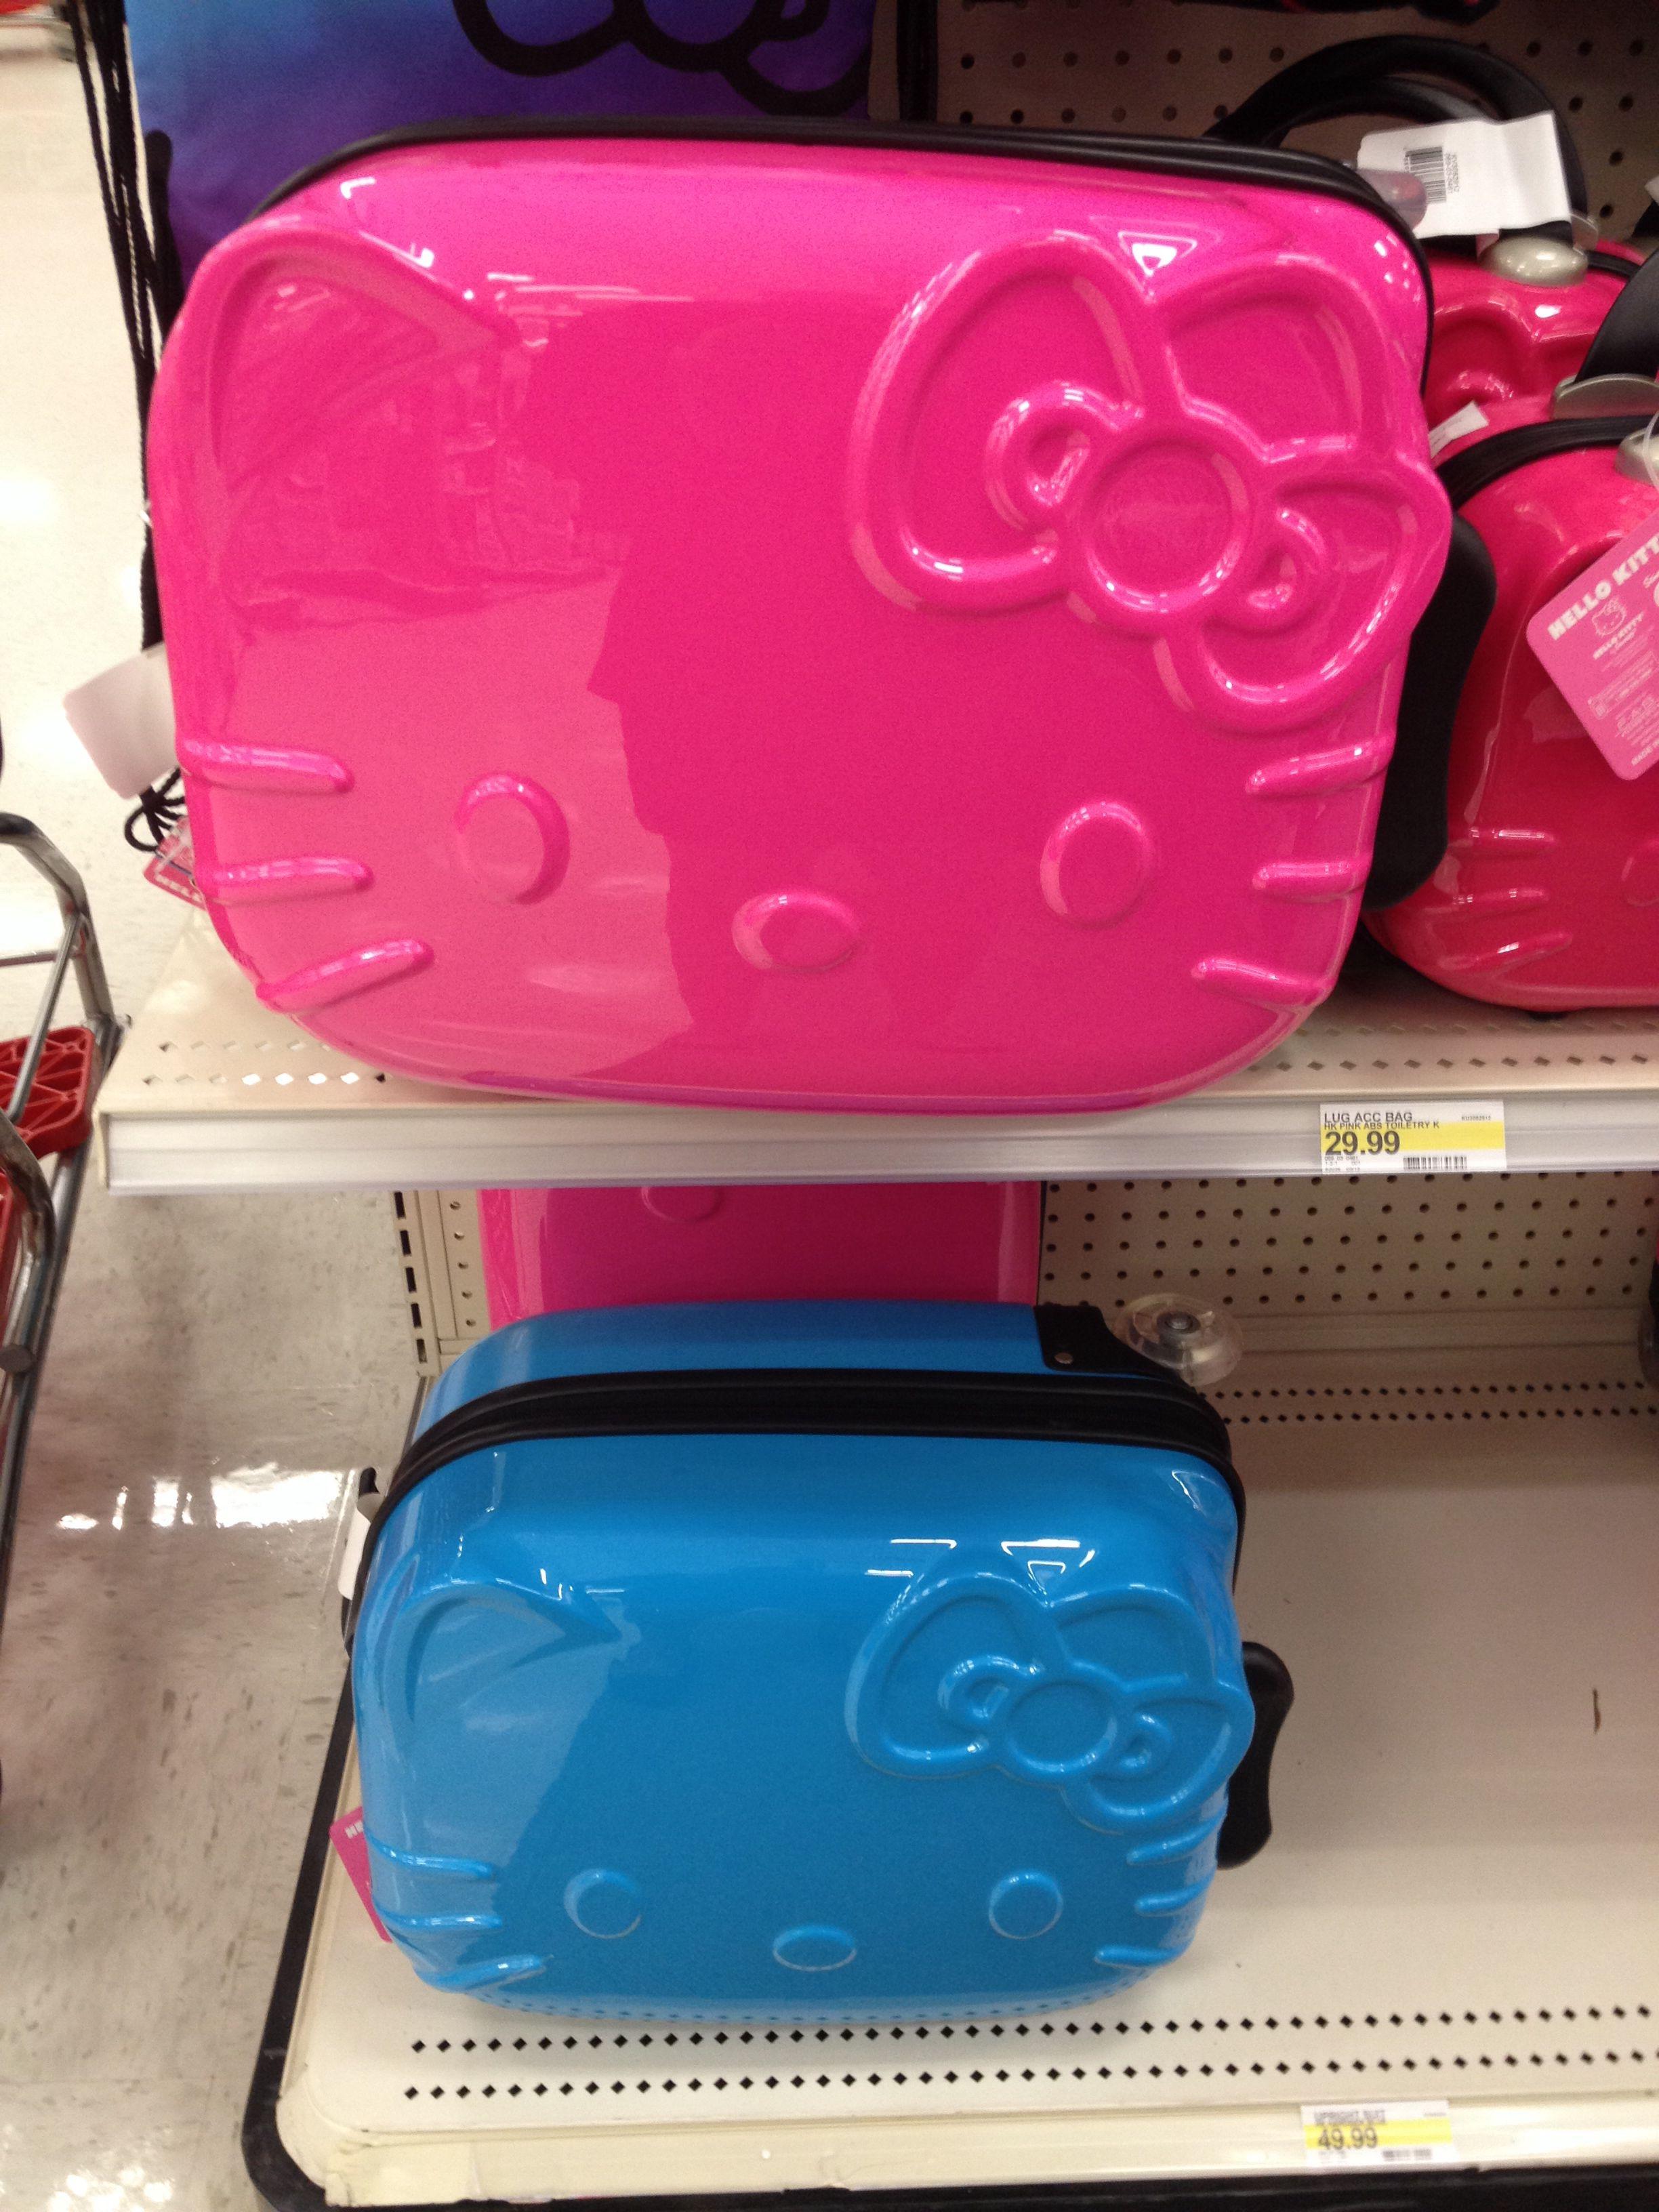 837e517c8 Hello Kitty Luggage @ Target | Hello Kitty | Hello kitty accessories ...